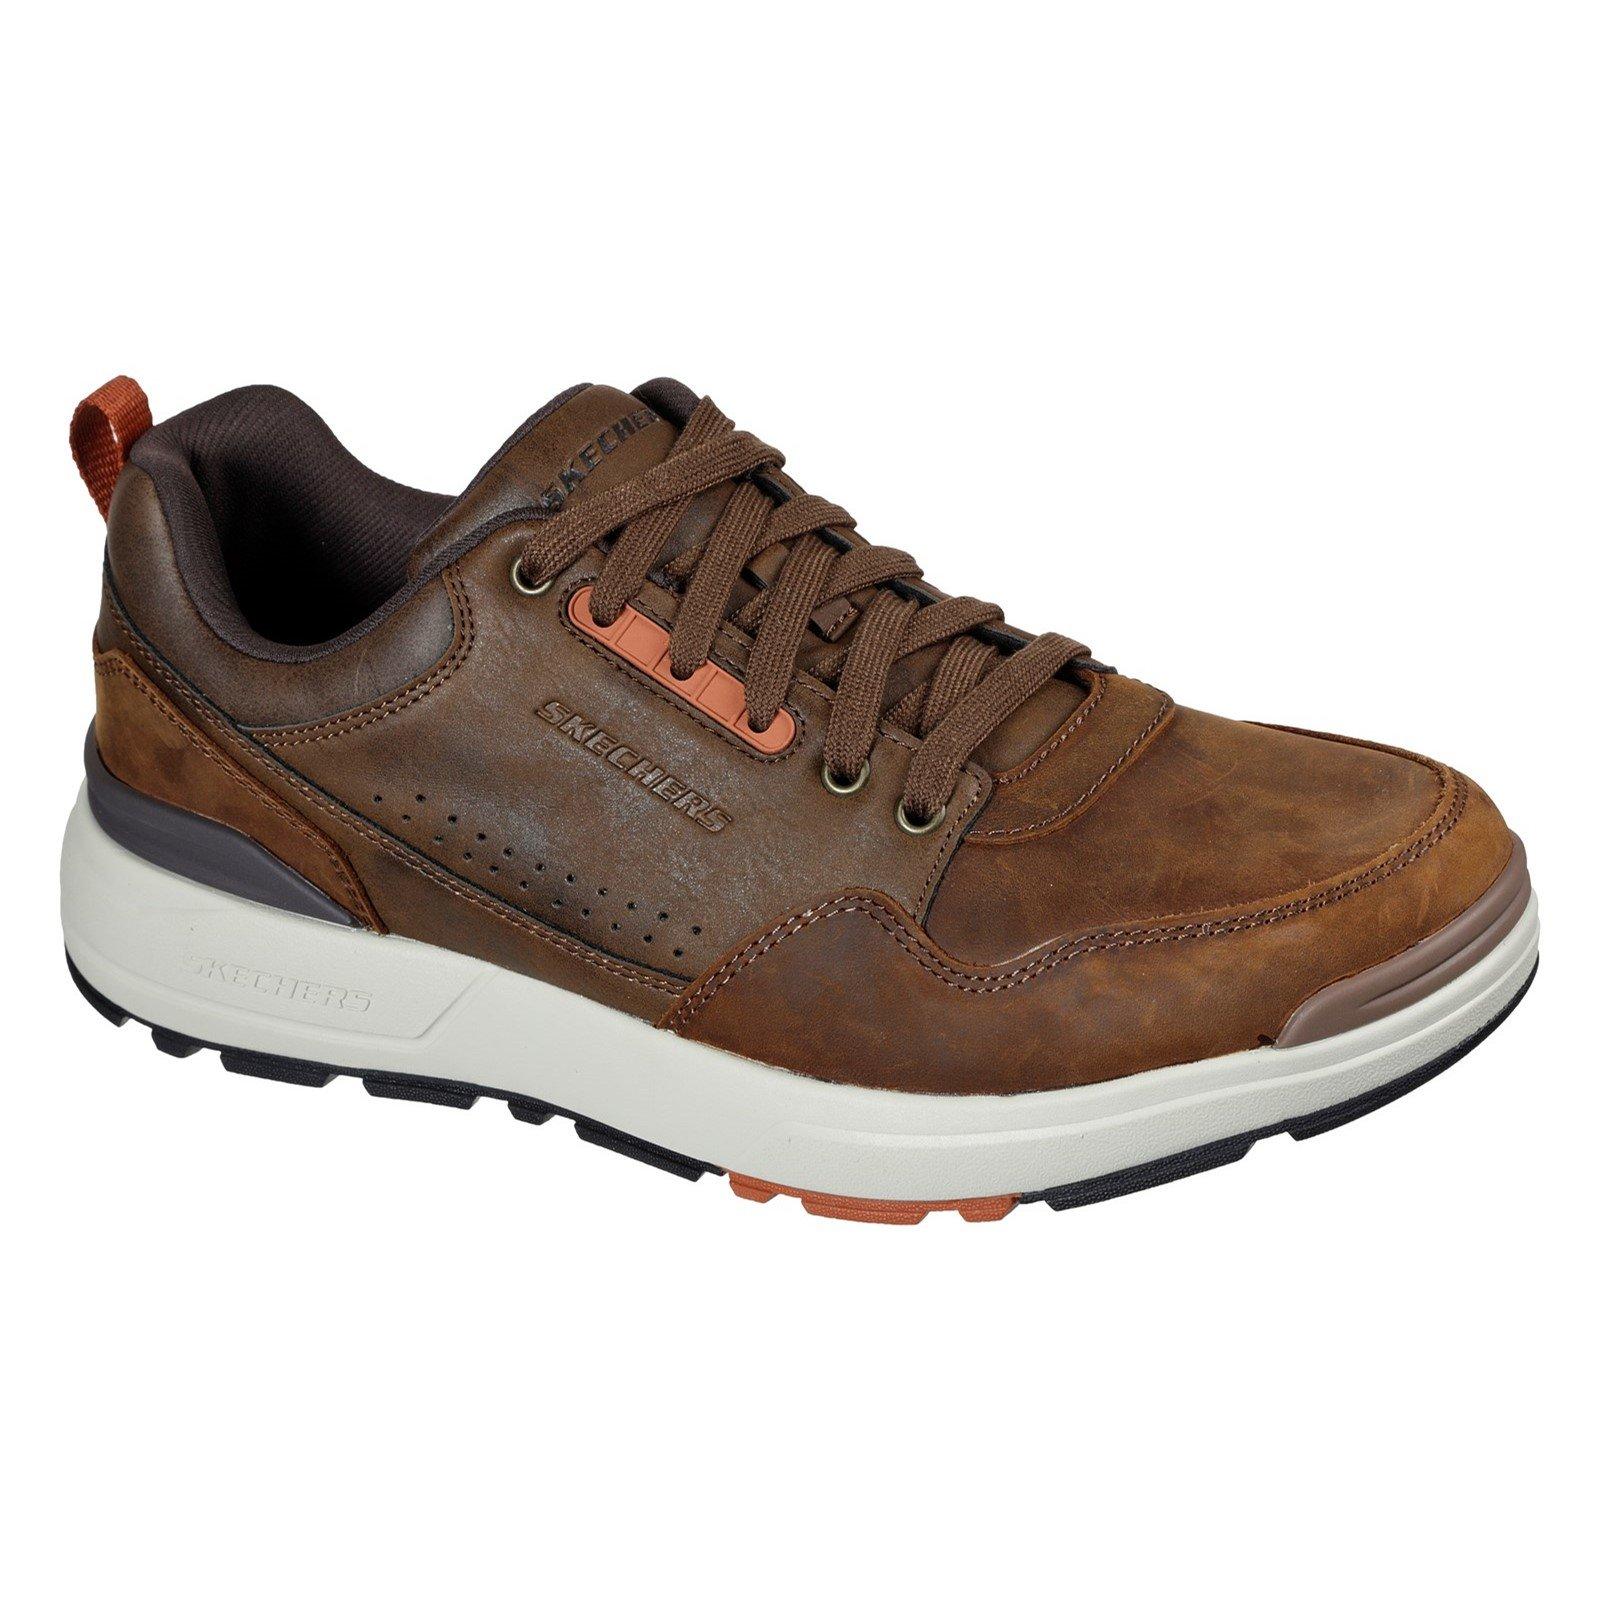 Skechers Men's Rozier Mancer Trainer Multicolor 32450 - Chocolate/Dark Brown 10